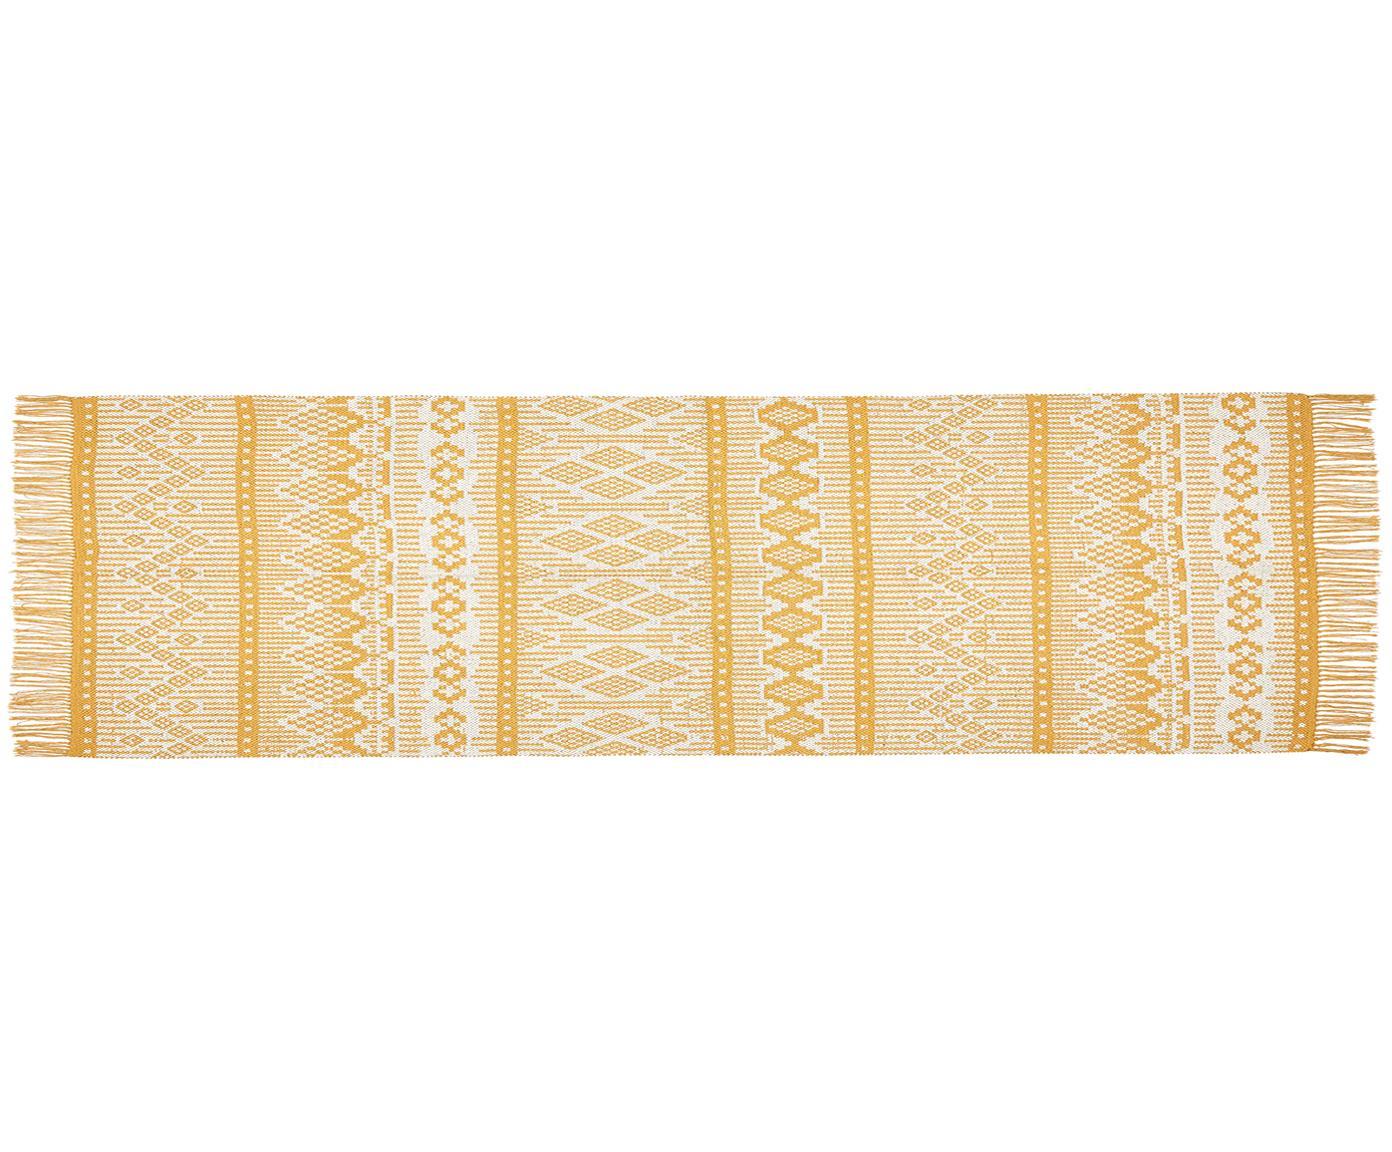 Ethno vloerkleed Panama van gerecycled katoen, Gerecycled katoen, Crèmekleurig, mosterdgeel, 70 x 250 cm